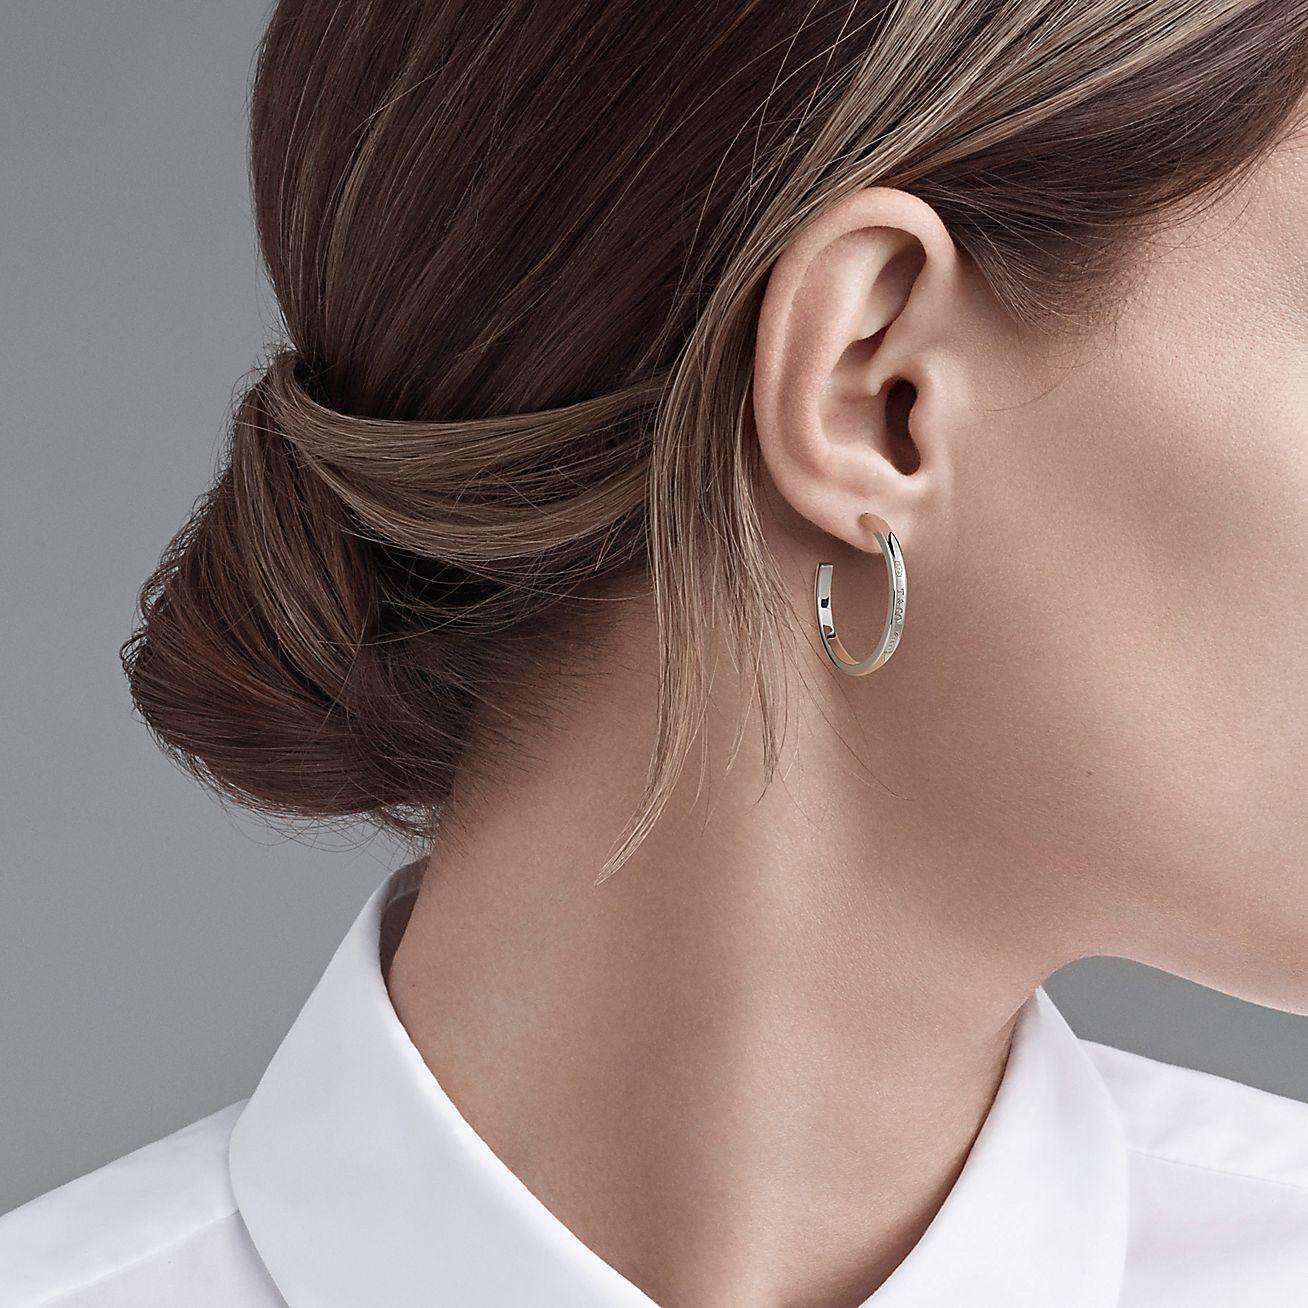 Tiffany 1837 Narrow Hoop Earrings In